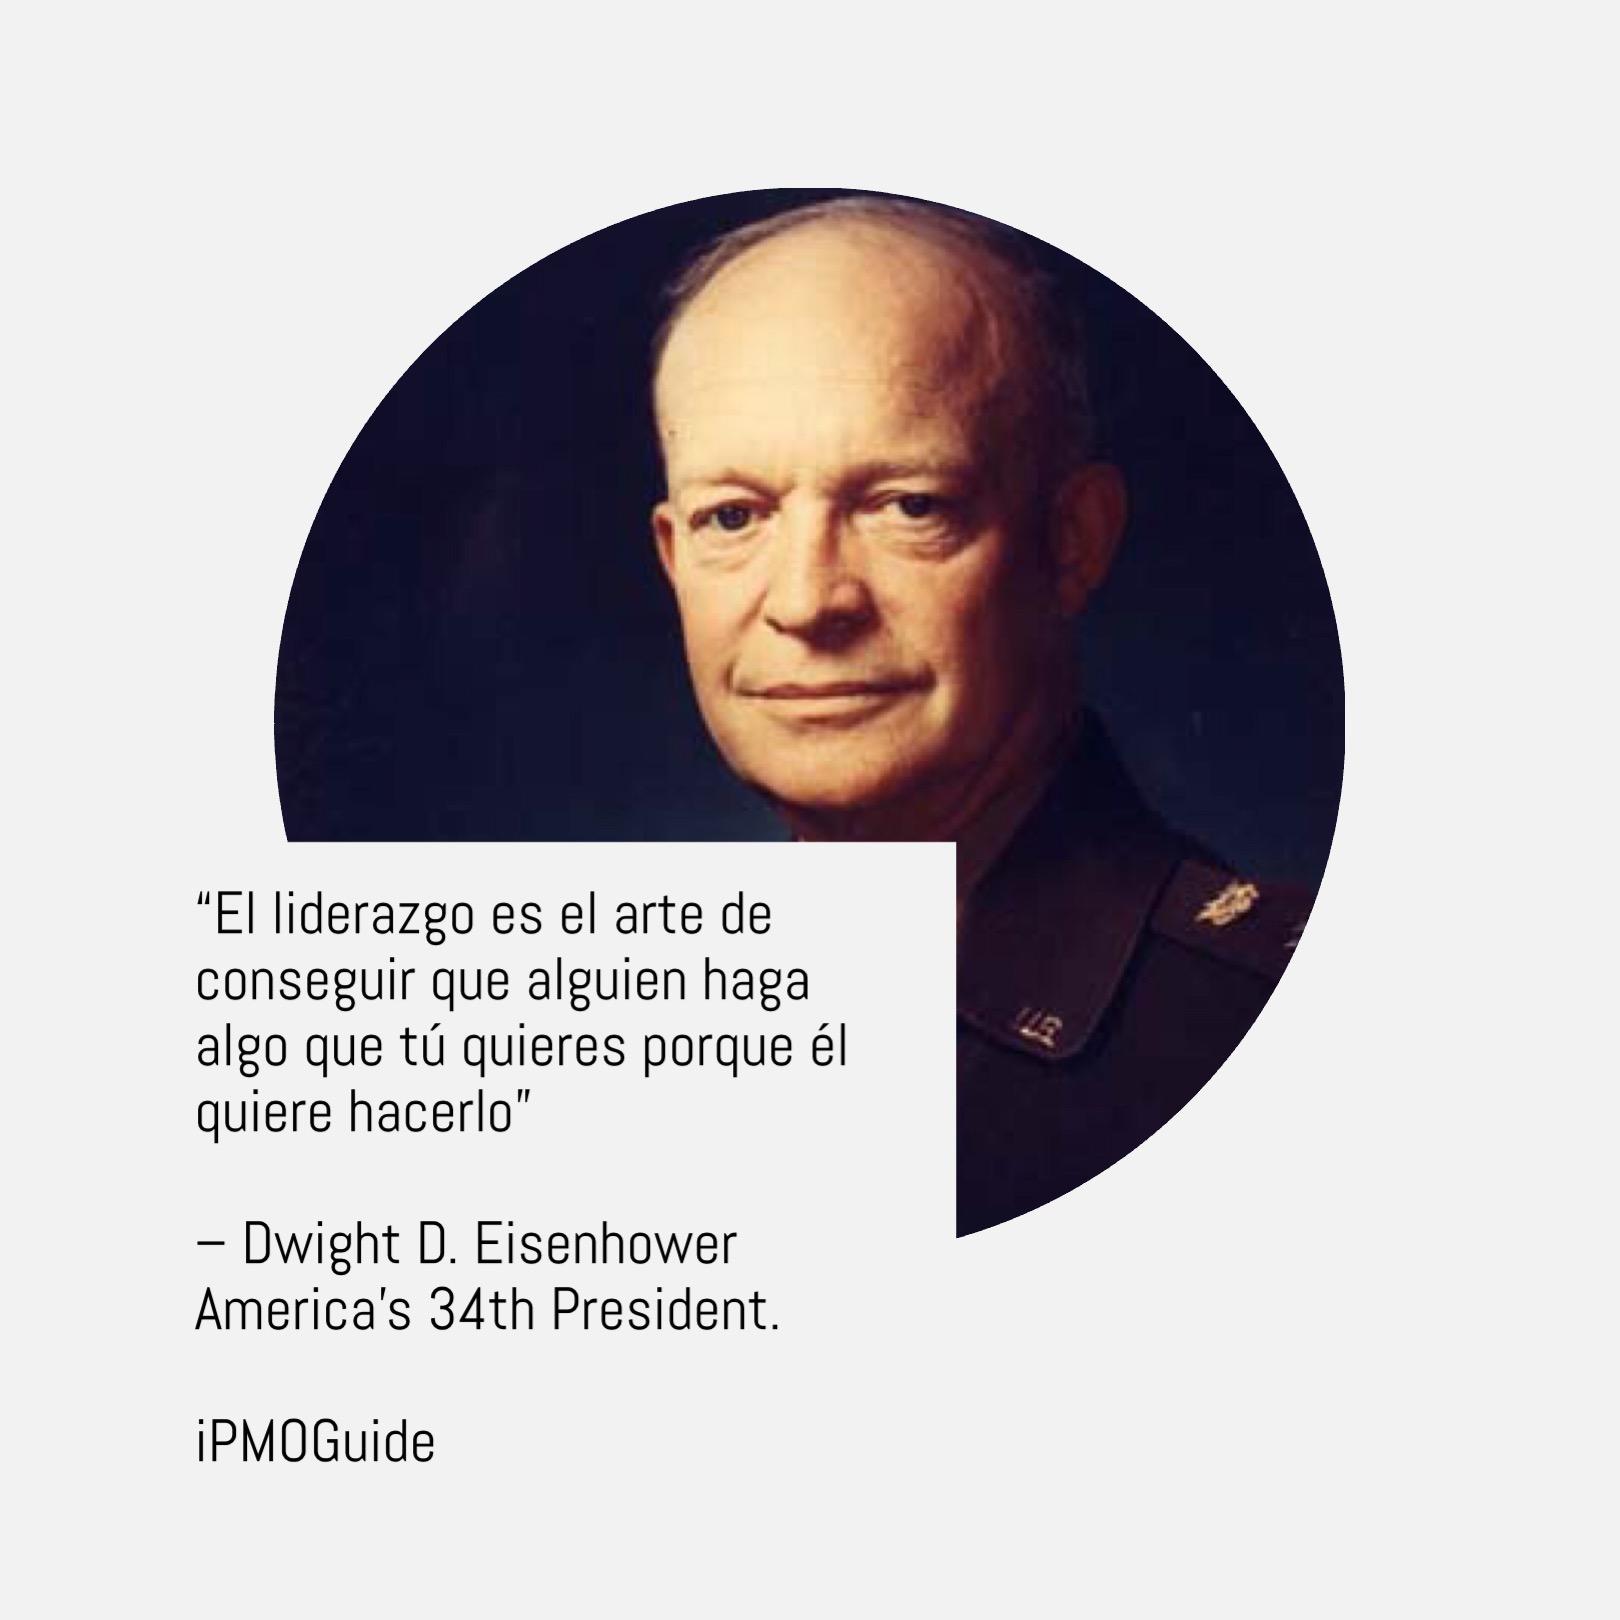 Dwight D. Elsenhower